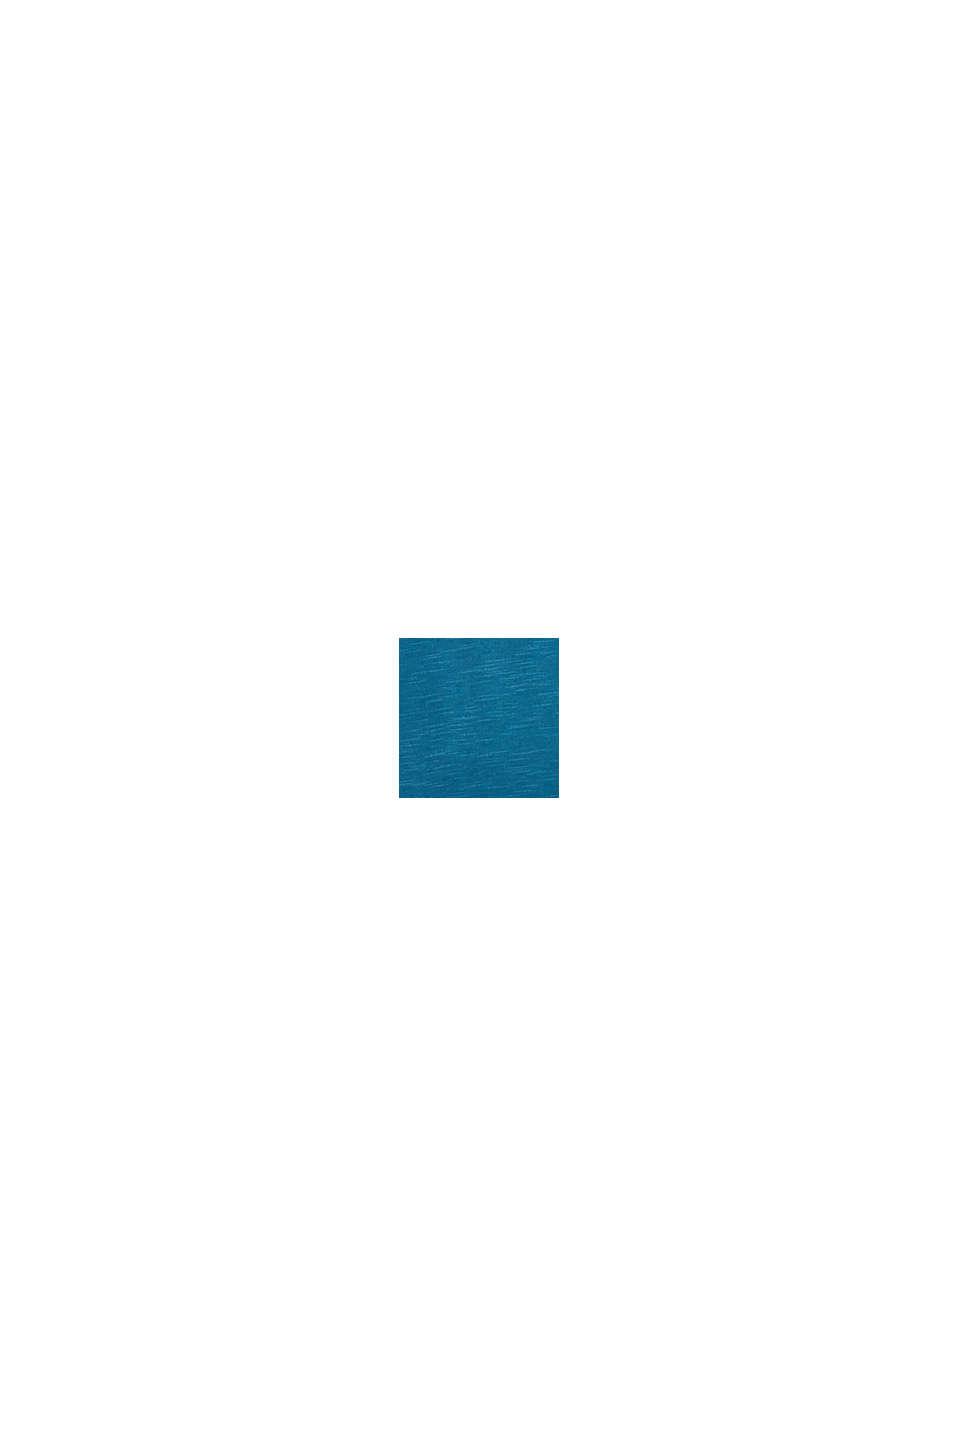 Jersey top made of 100% organic cotton, PETROL BLUE, swatch